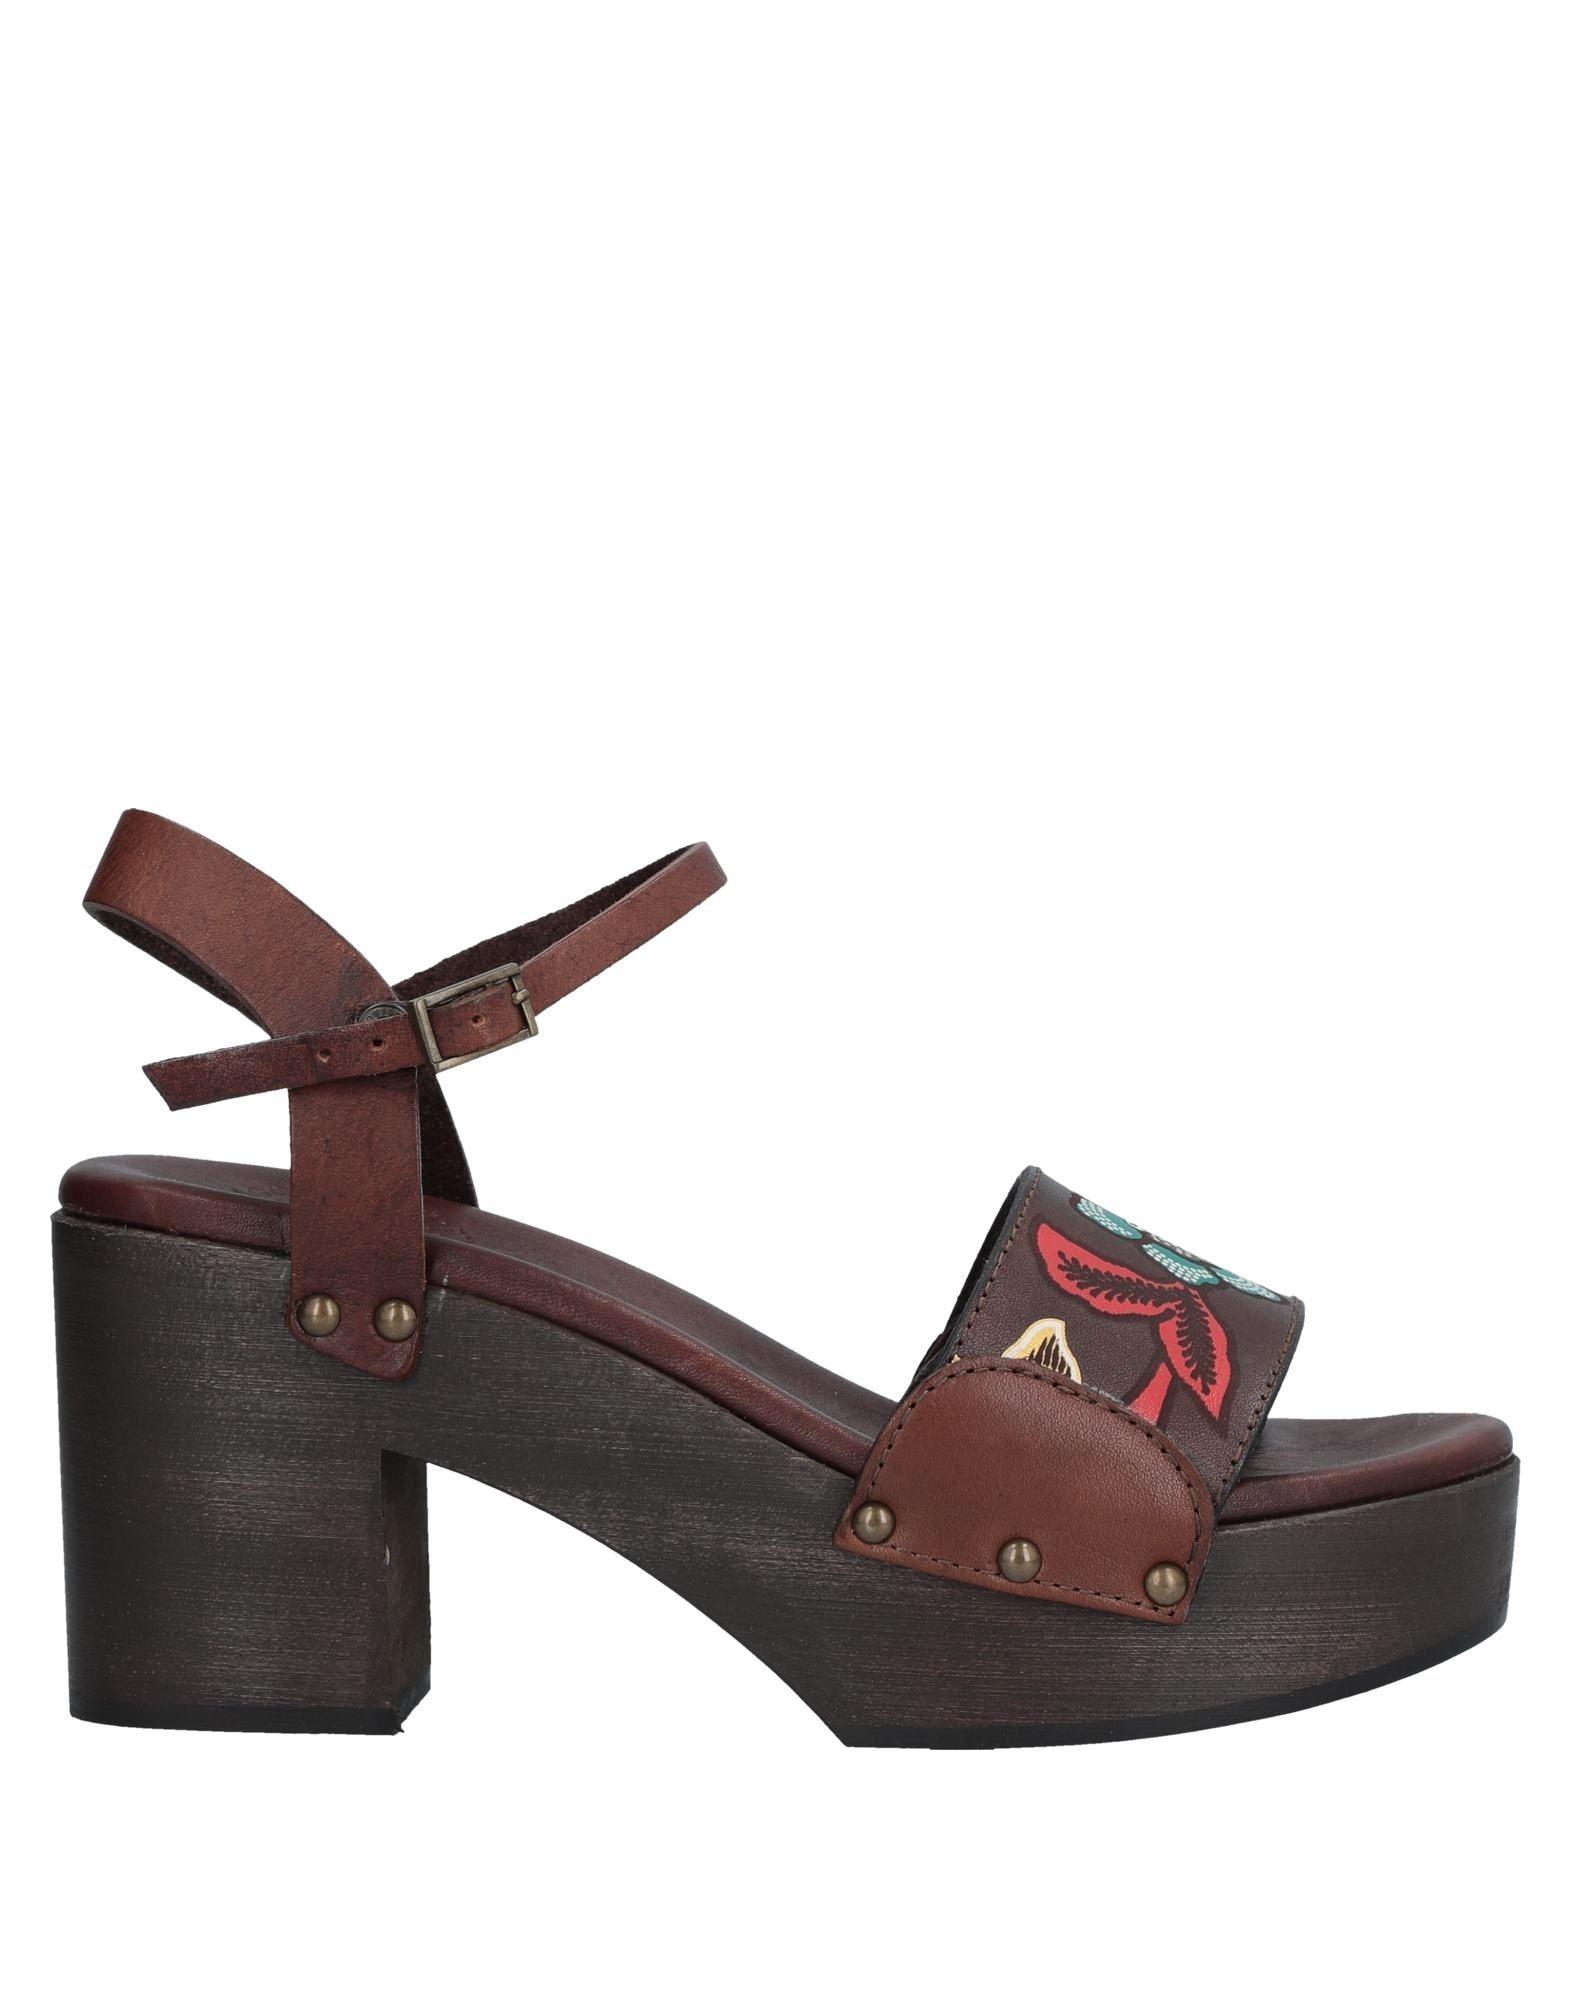 Gut tragenCampomaggi um billige Schuhe zu tragenCampomaggi Gut Sandalen Damen  11537353PL 24d672